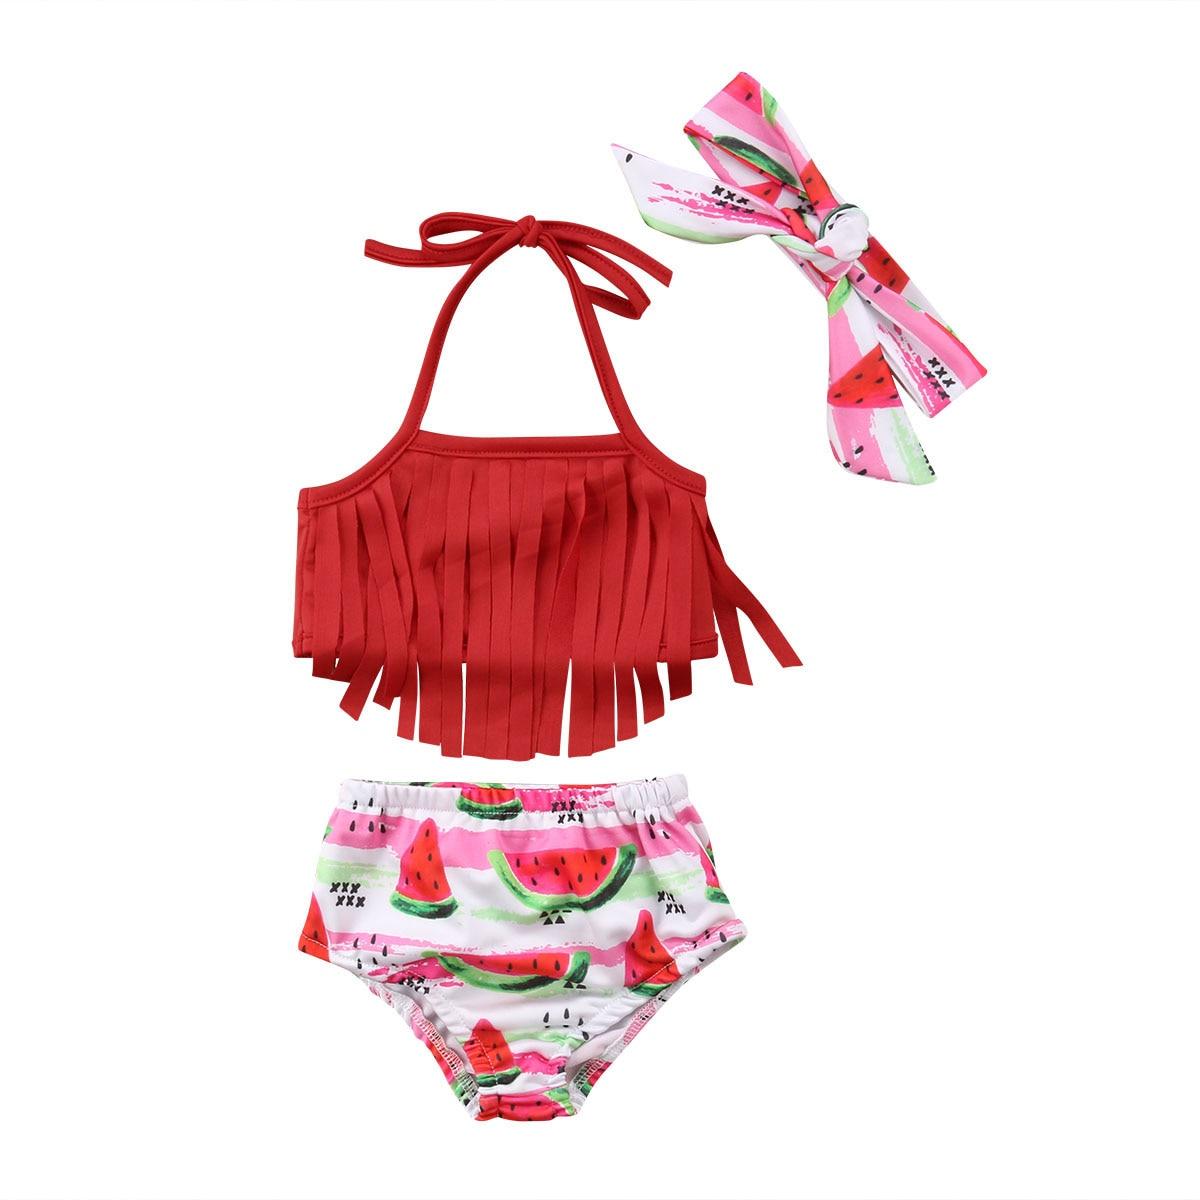 2018 Baby Girls Tassel Swimwear Set Newborn Girls Halter Crop Tops+Fruit Shorts 2pcs Bikini Swimsuit Bathing Suit